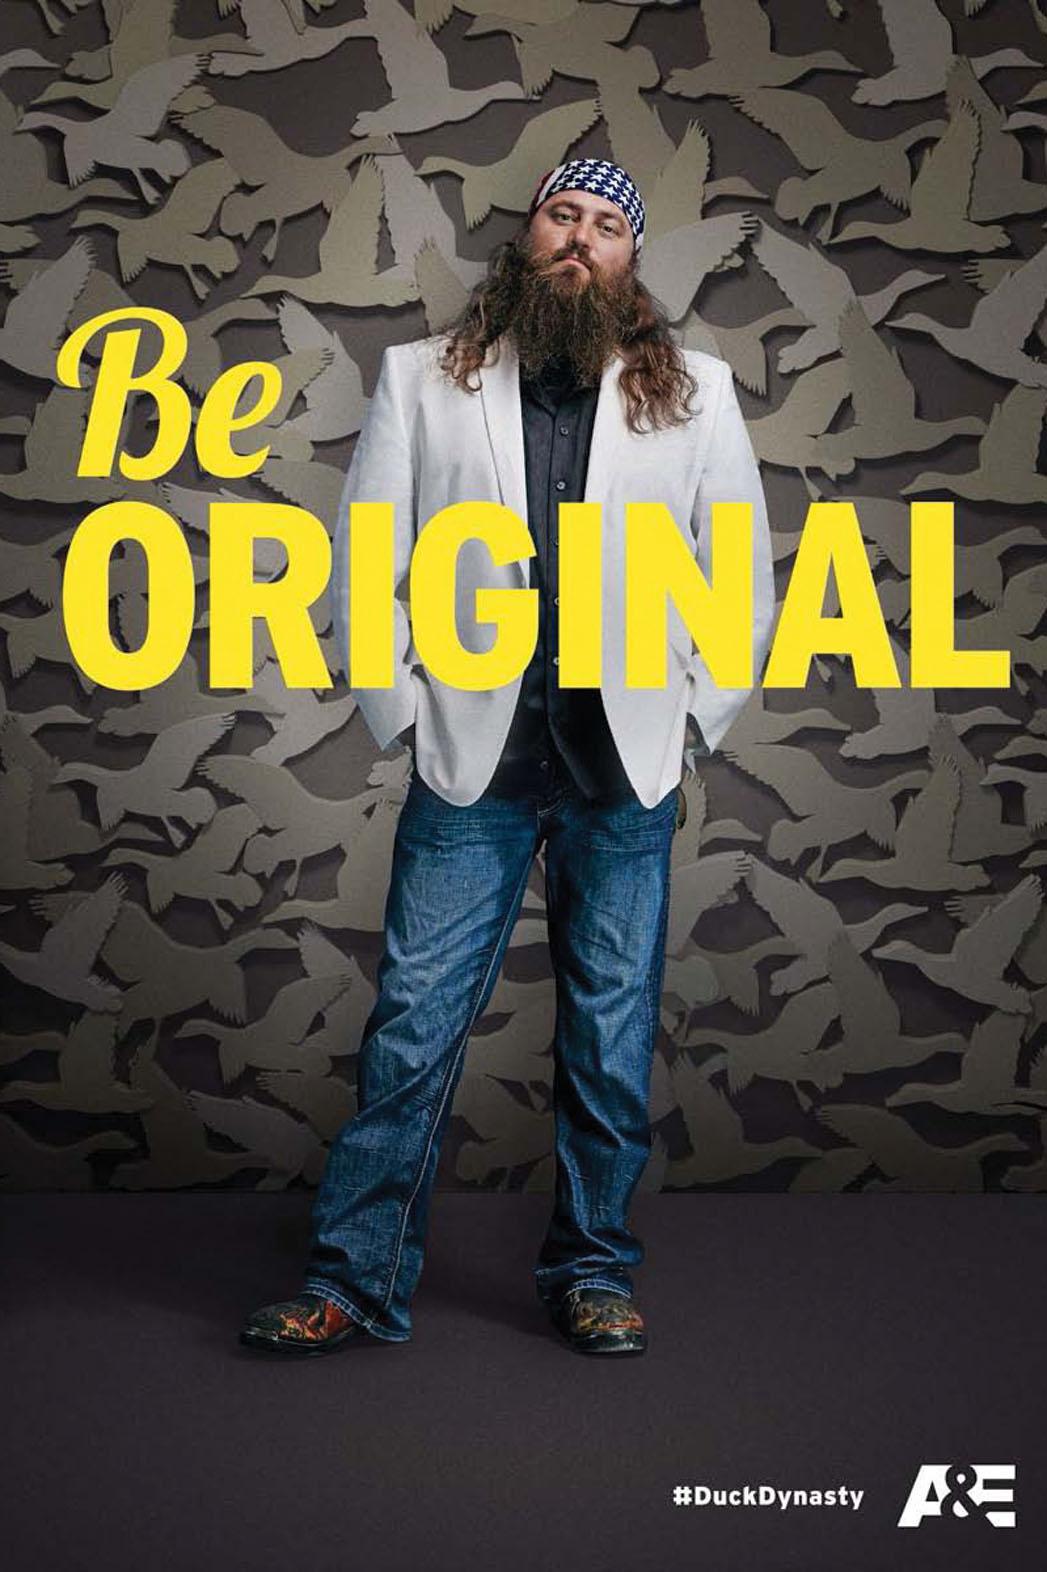 Duck Dynasty Be Original - P 2013